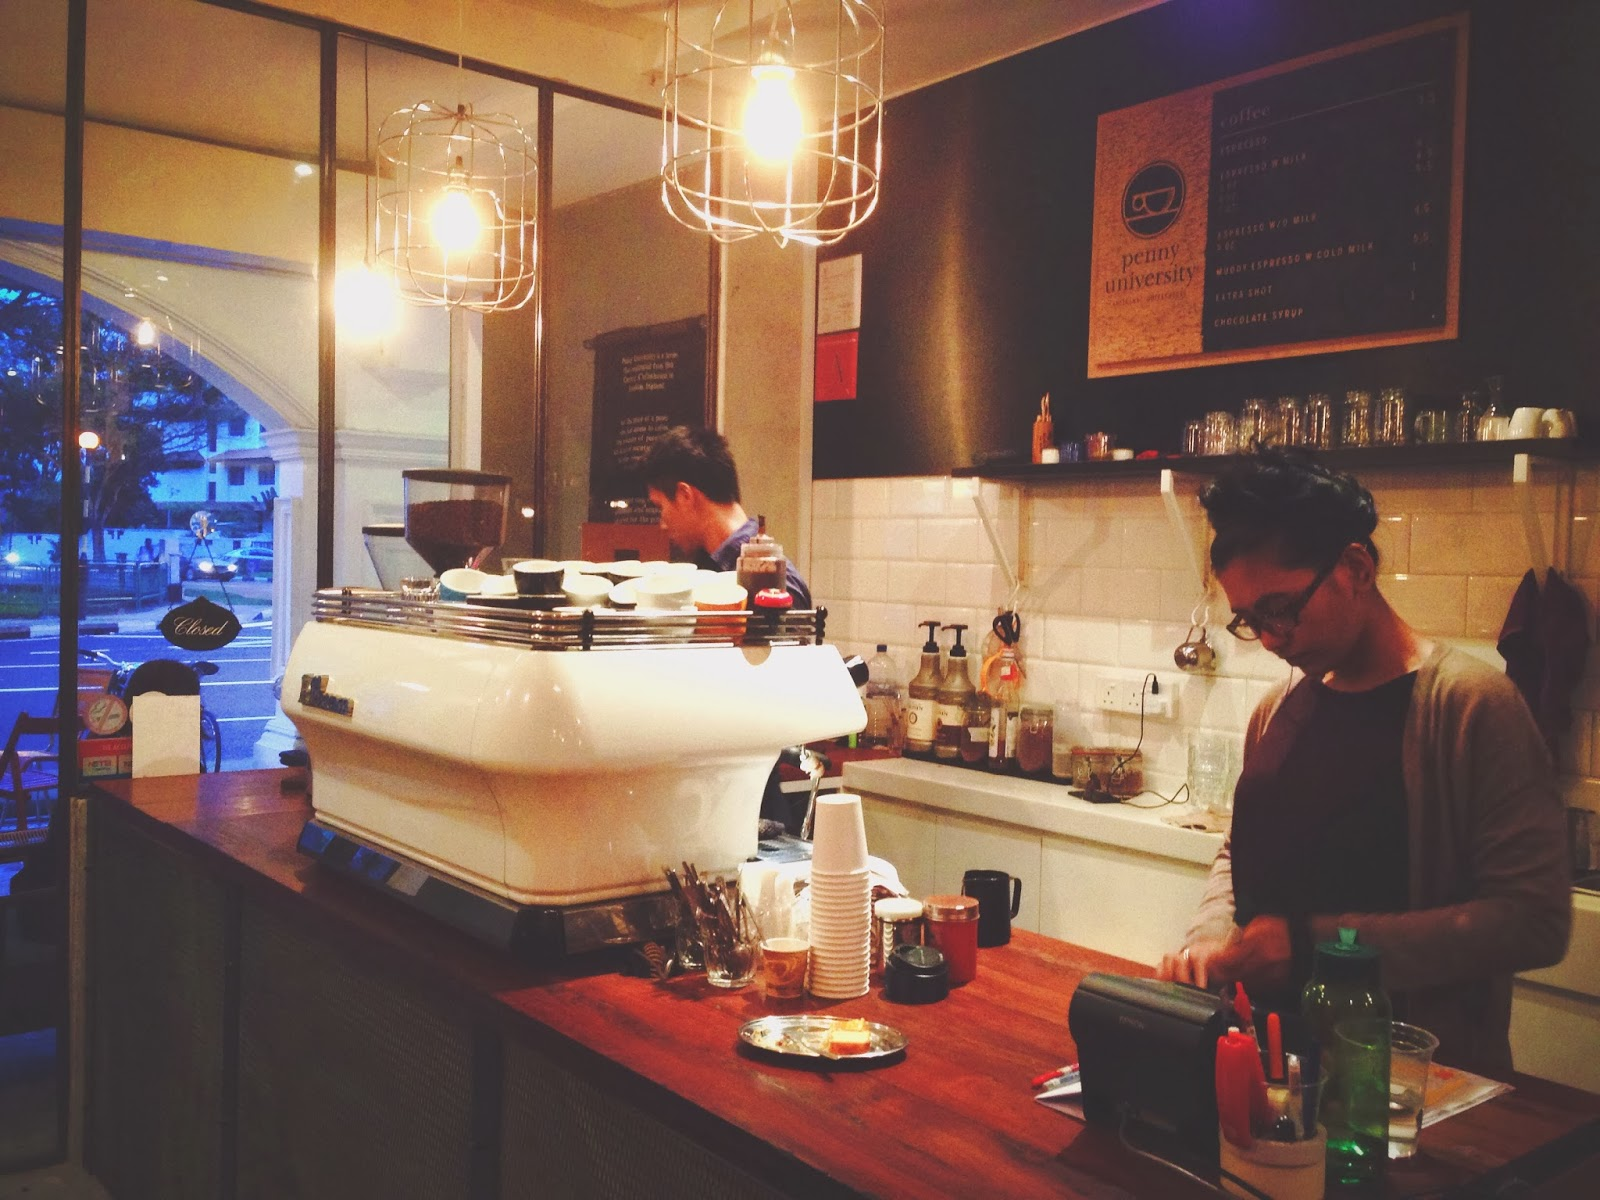 Penny University Coffee Roaster